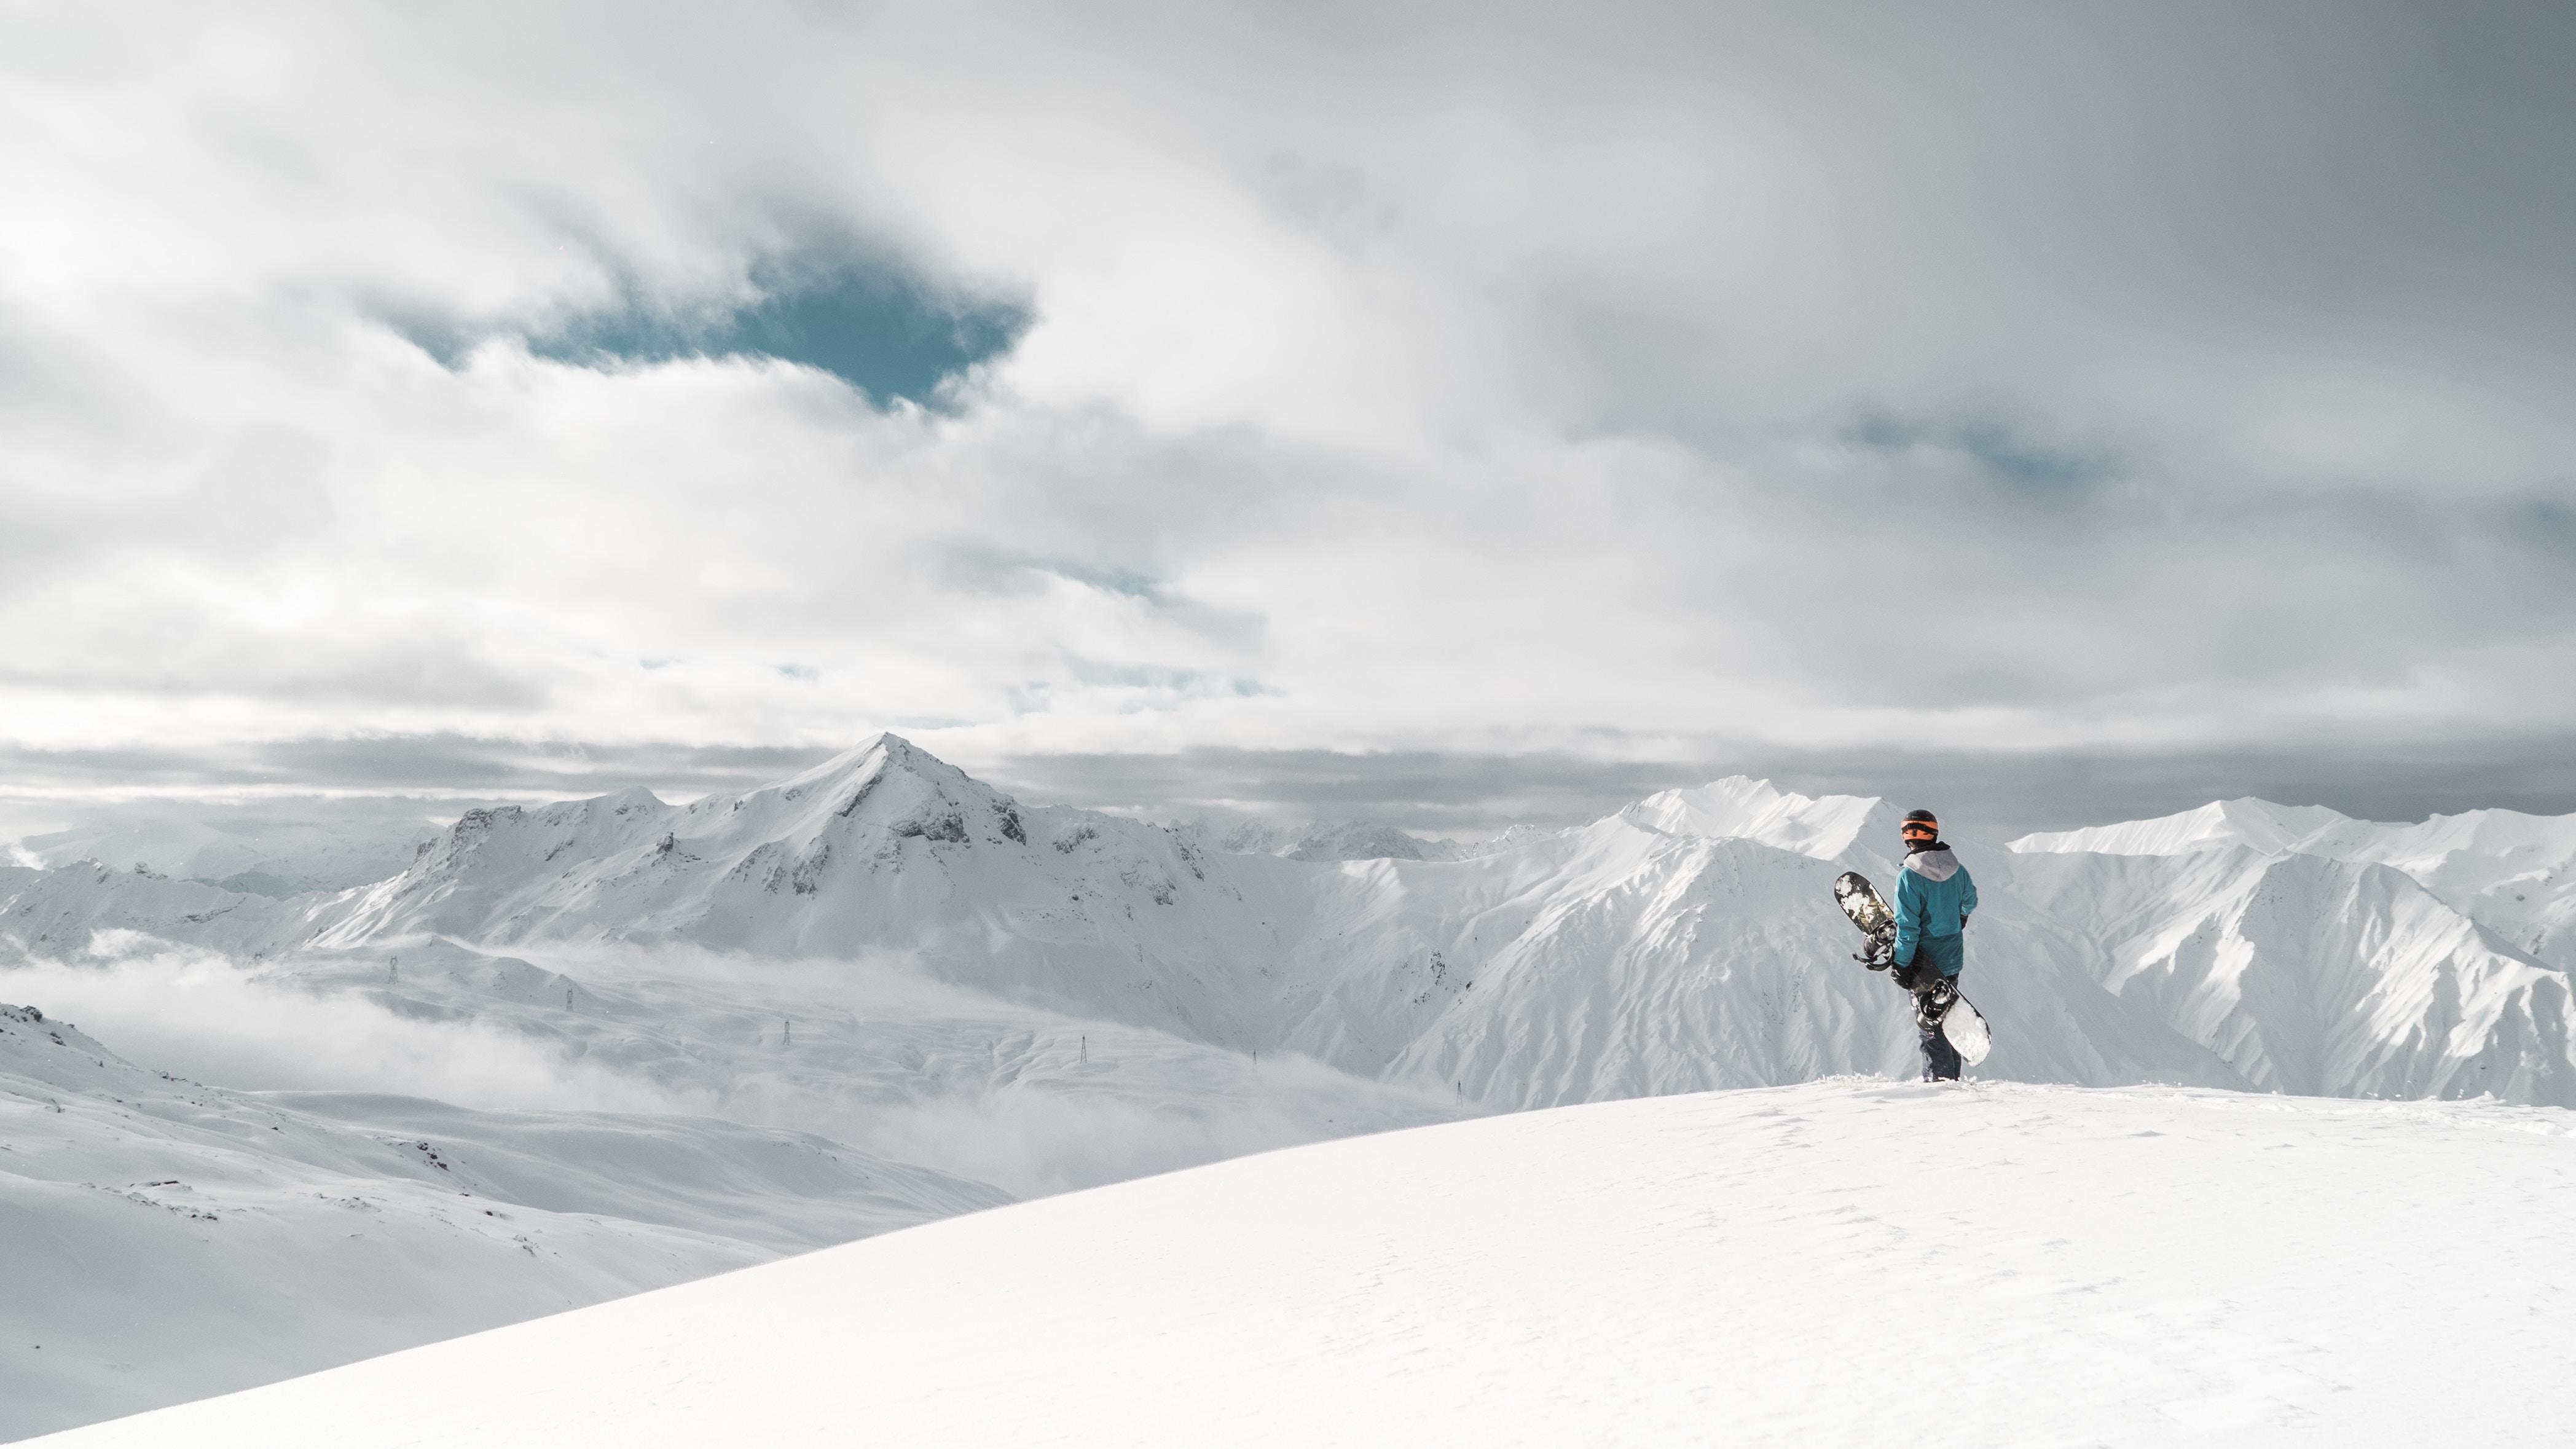 Les Menuires Frankrijk snowboard in de sneeuw